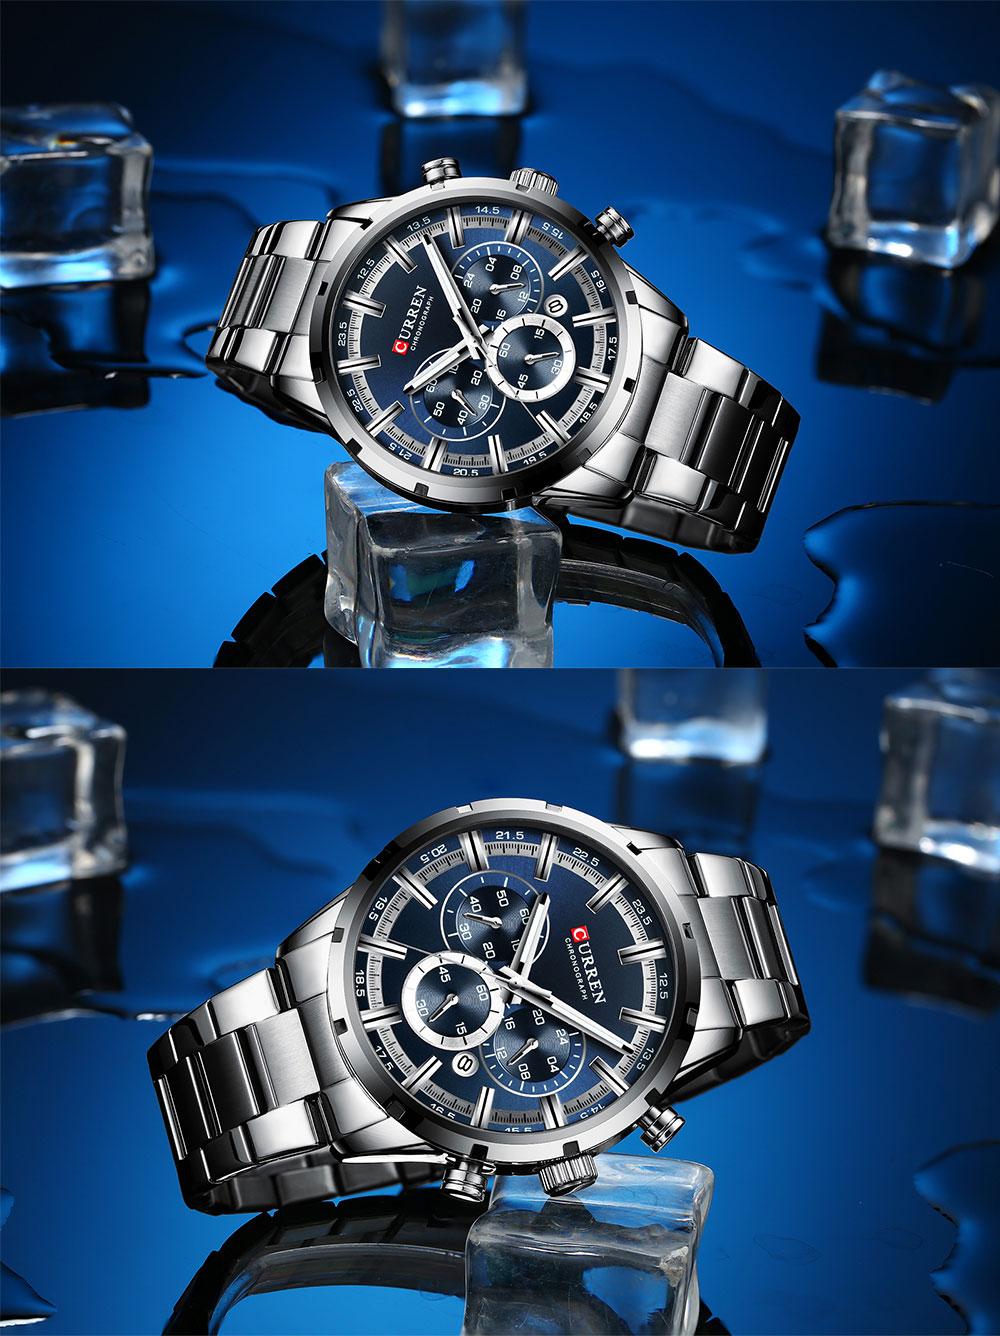 H7f8f8fbc2da94eeea62d3a3bc1530028v CURREN New Fashion Mens Watches Quartz Chronograph